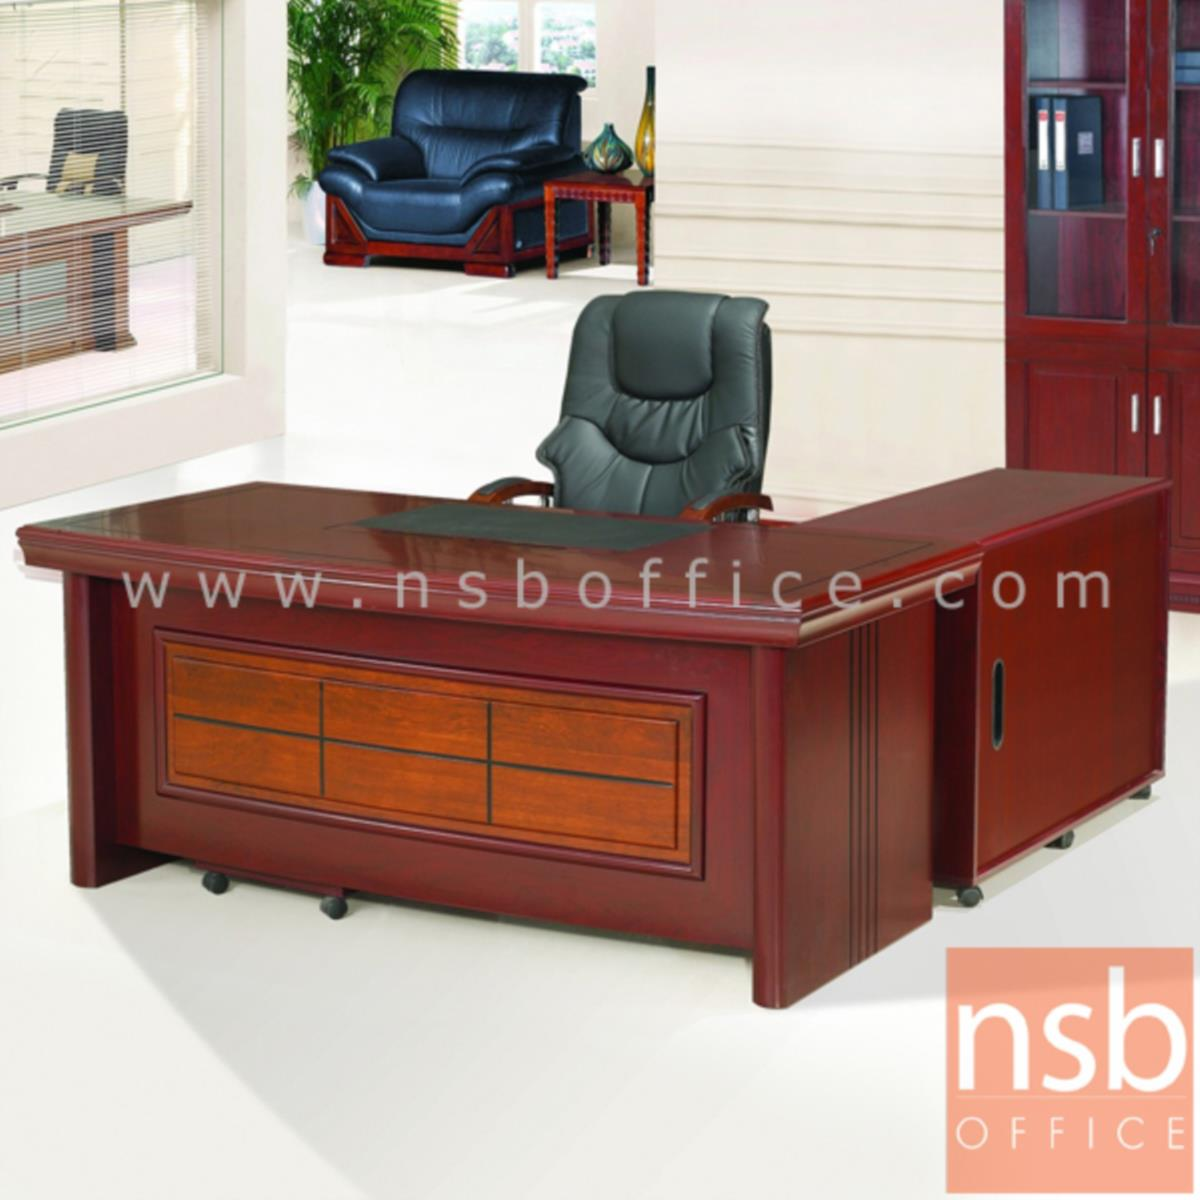 A06A066:โต๊ะผู้บริหารตัวแอล  รุ่น Schneider (ชไนเดอร์) ขนาด 160W ,180W ,200W cm. พร้อมตู้ลิ้นชักและตู้ข้าง